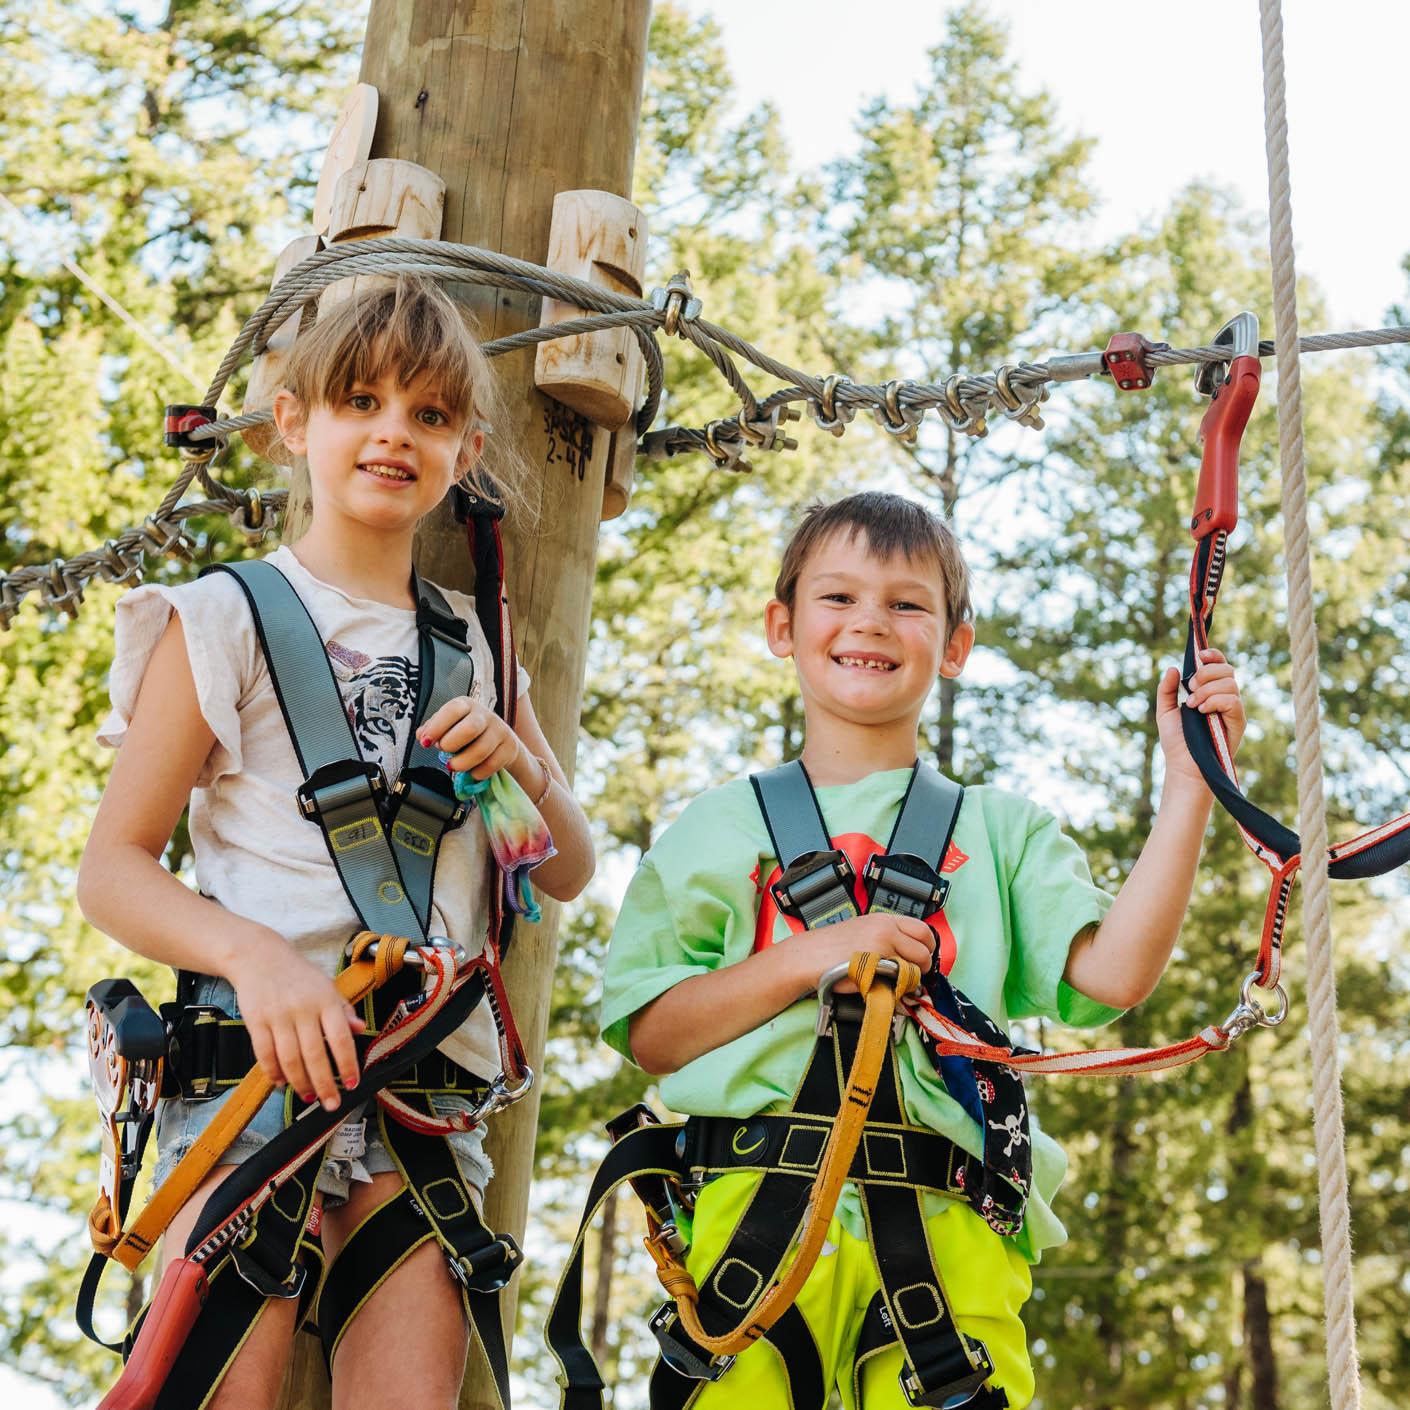 Jackson Hole Basecamp adrenaline course